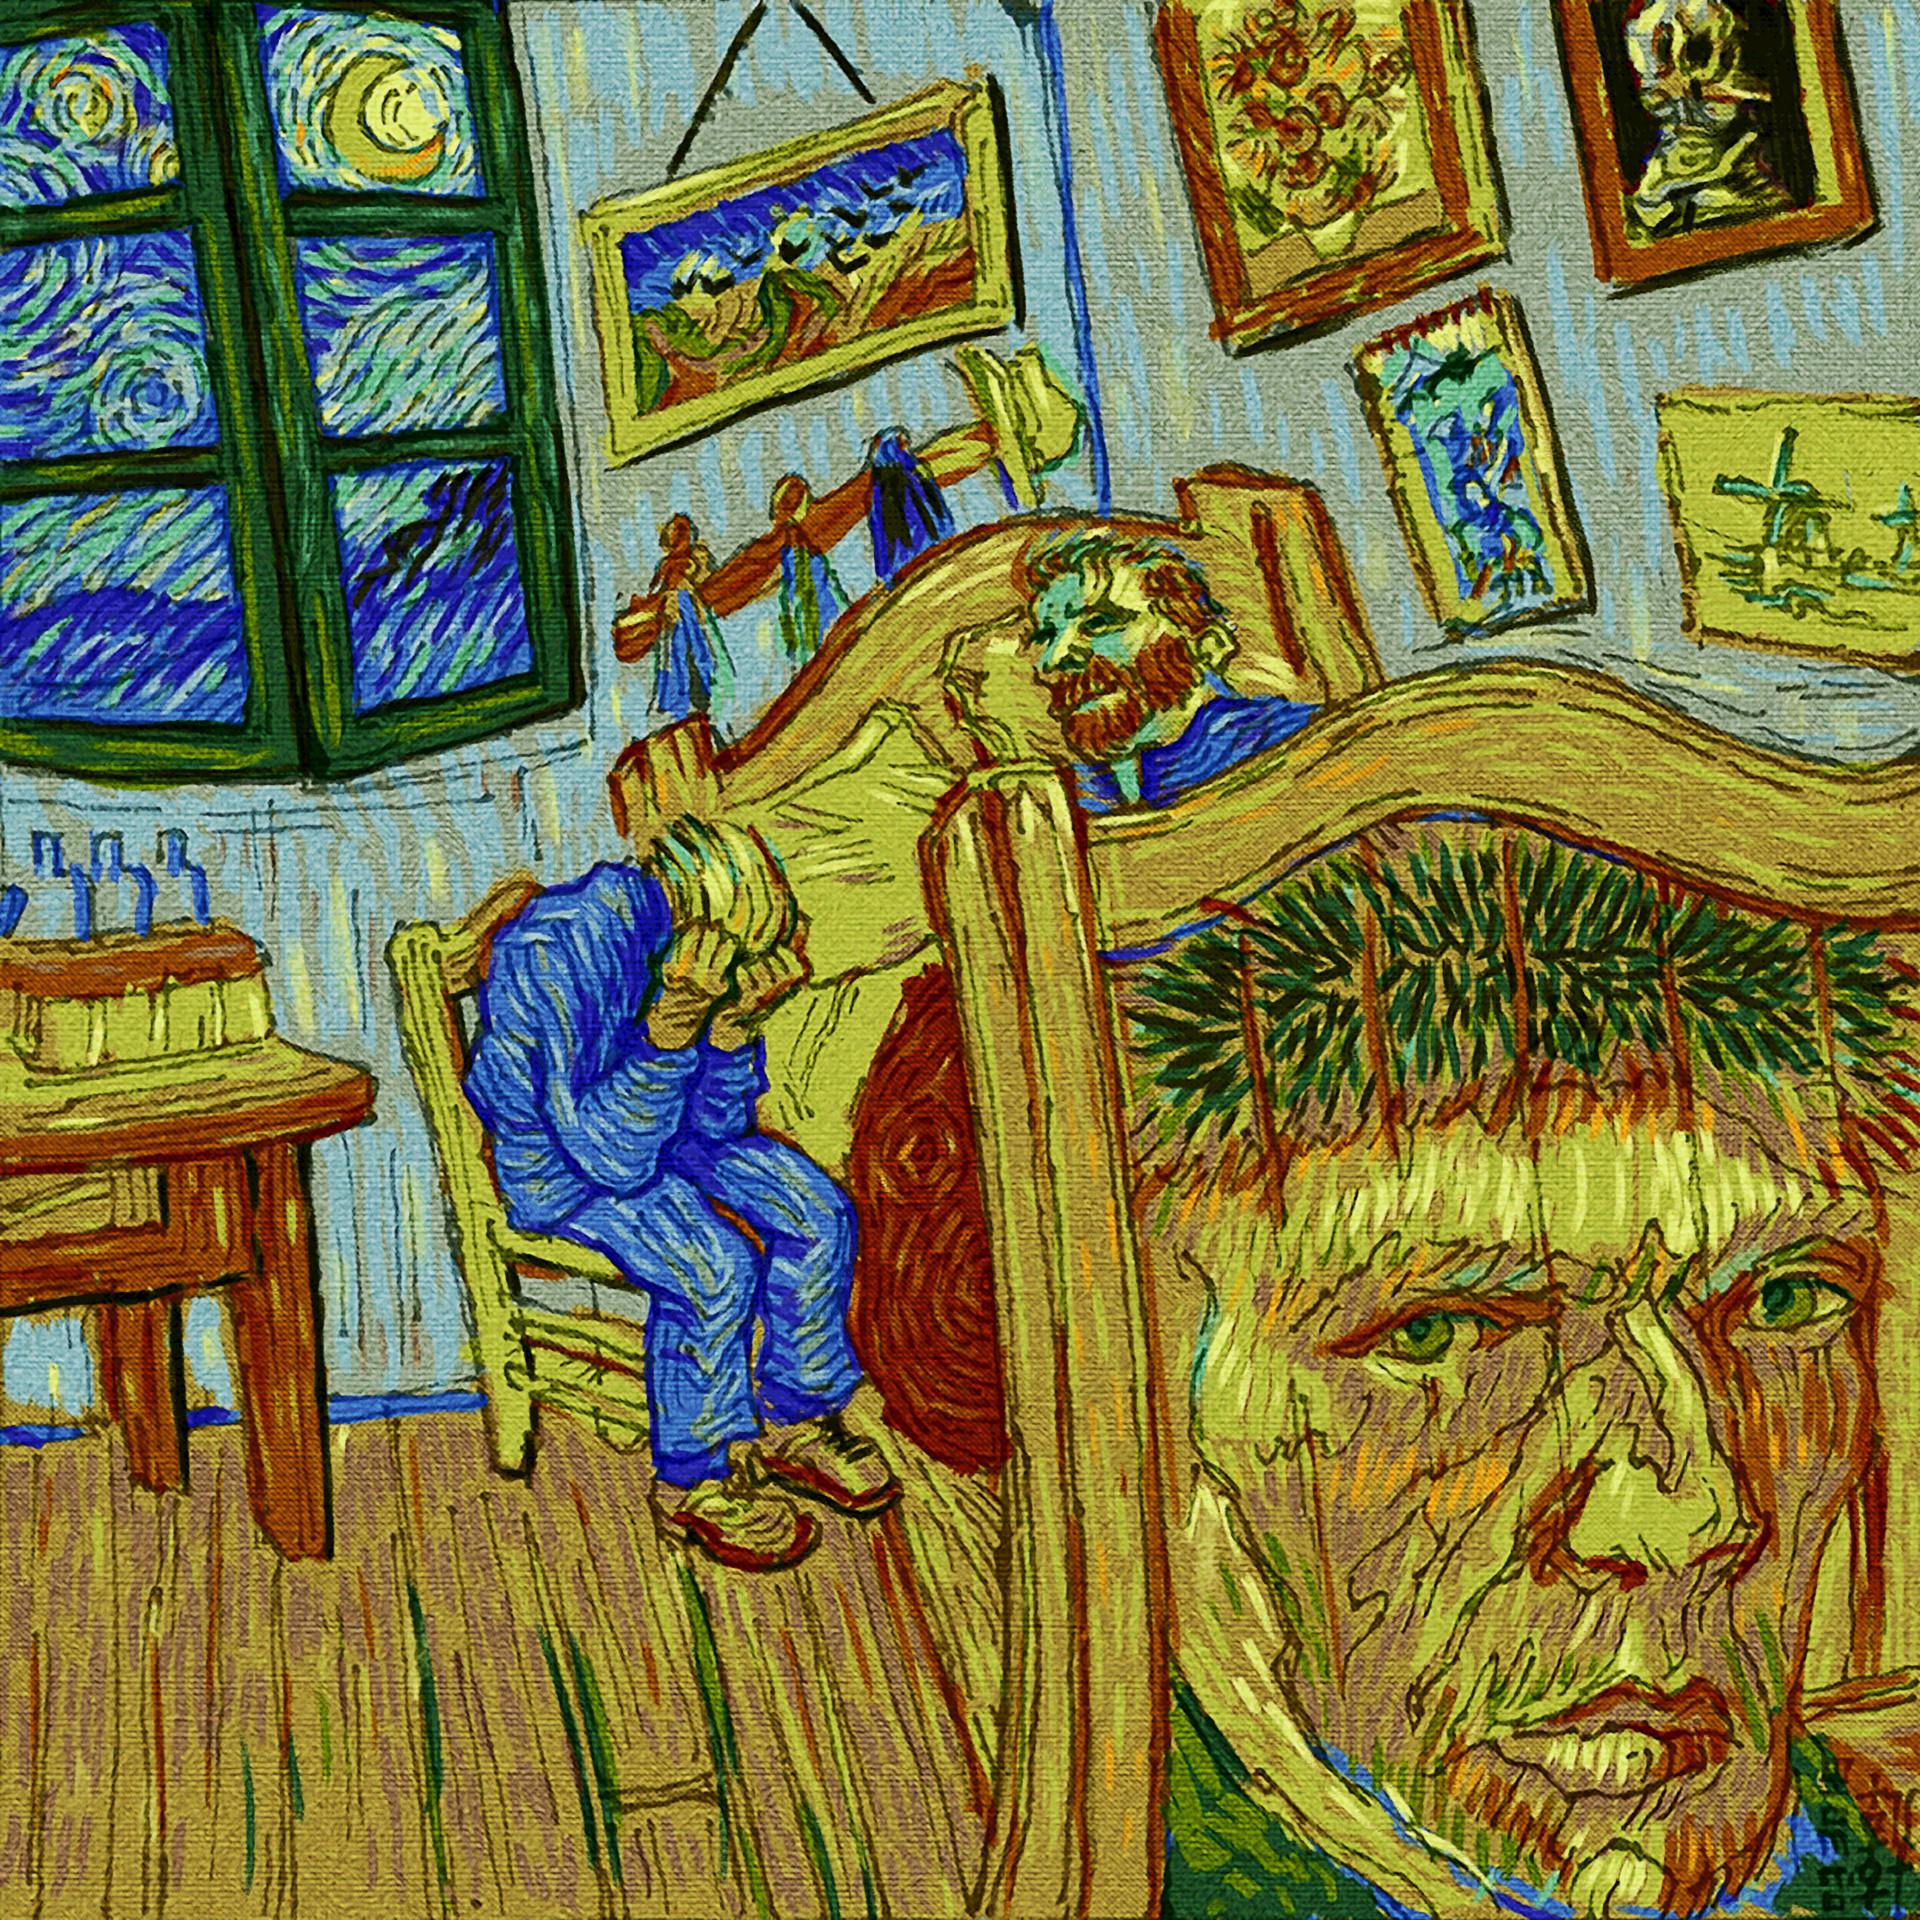 Day 03-30-18 - Van Gogh